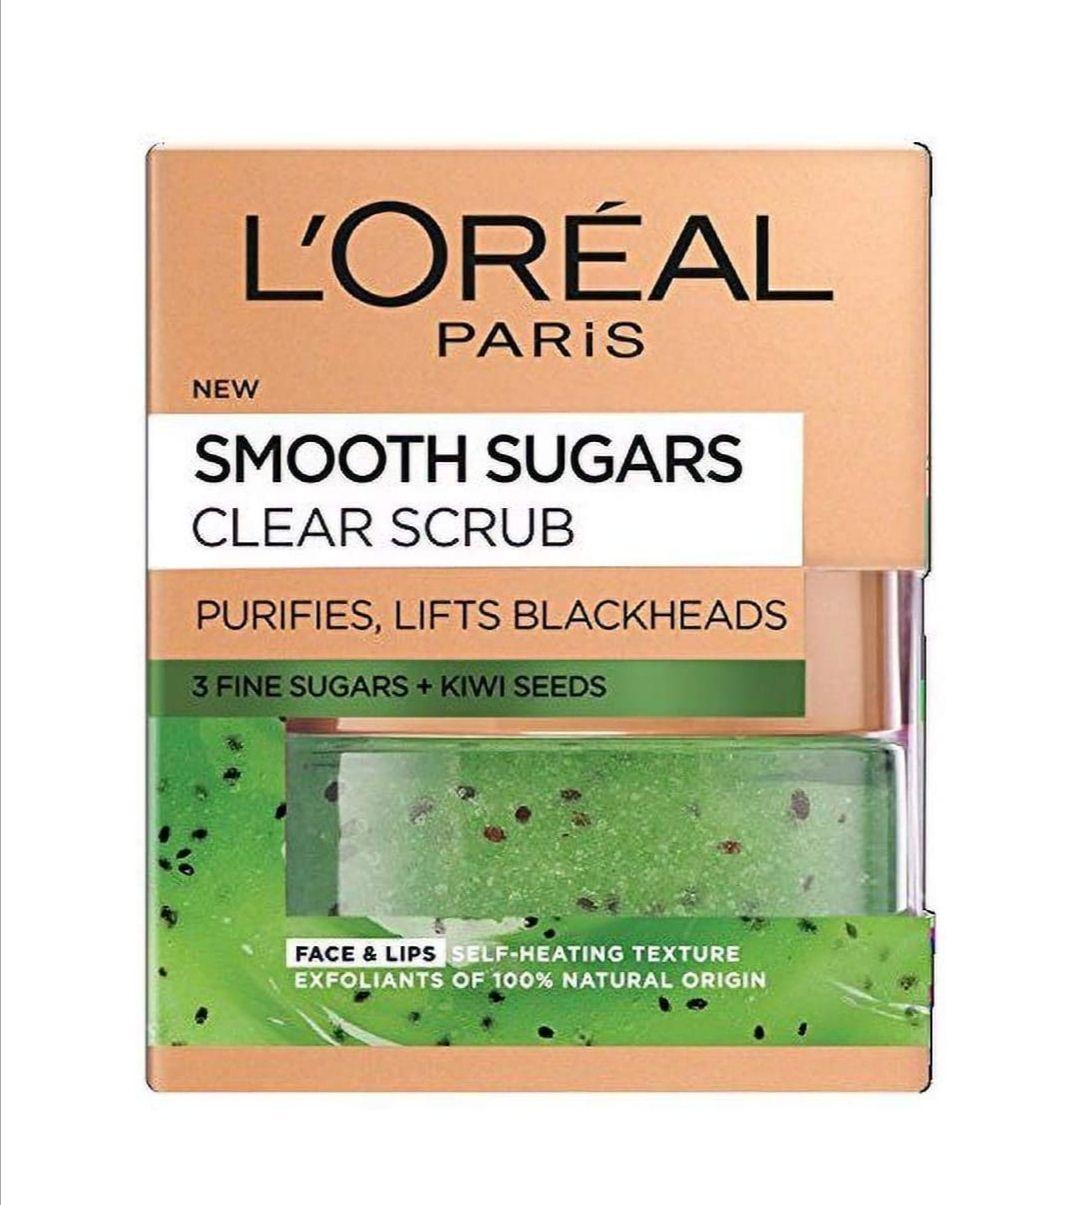 L'Oréal Paris Smooth Sugar Clear Kiwi Face & Lip Scrub (50ml) £5 @Prime / £9.49 Non Prime at Amazon